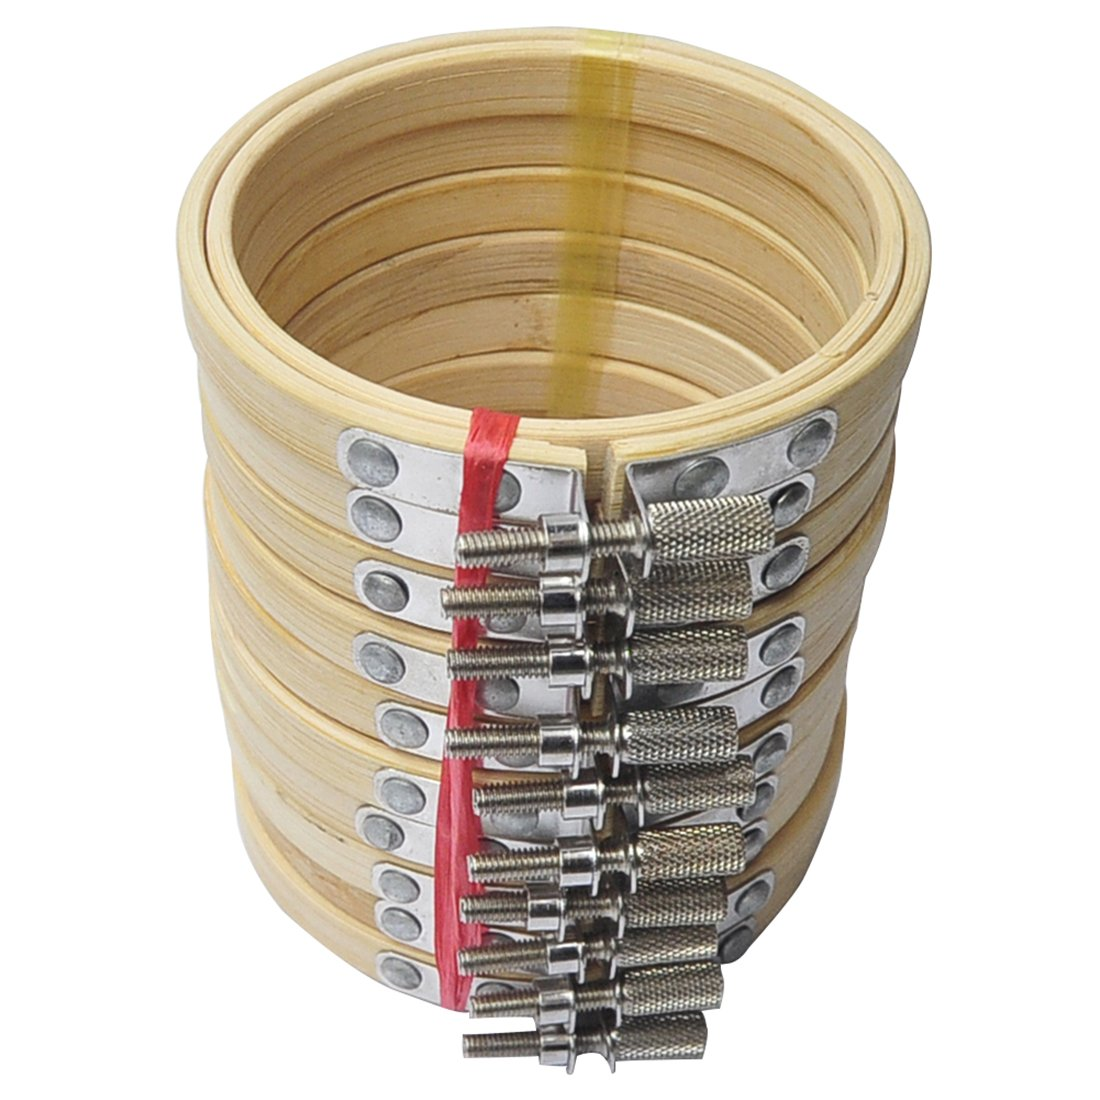 10/piezas 5/cm bordado aro de bamb/ú c/írculo de punto de cruz anillo aro